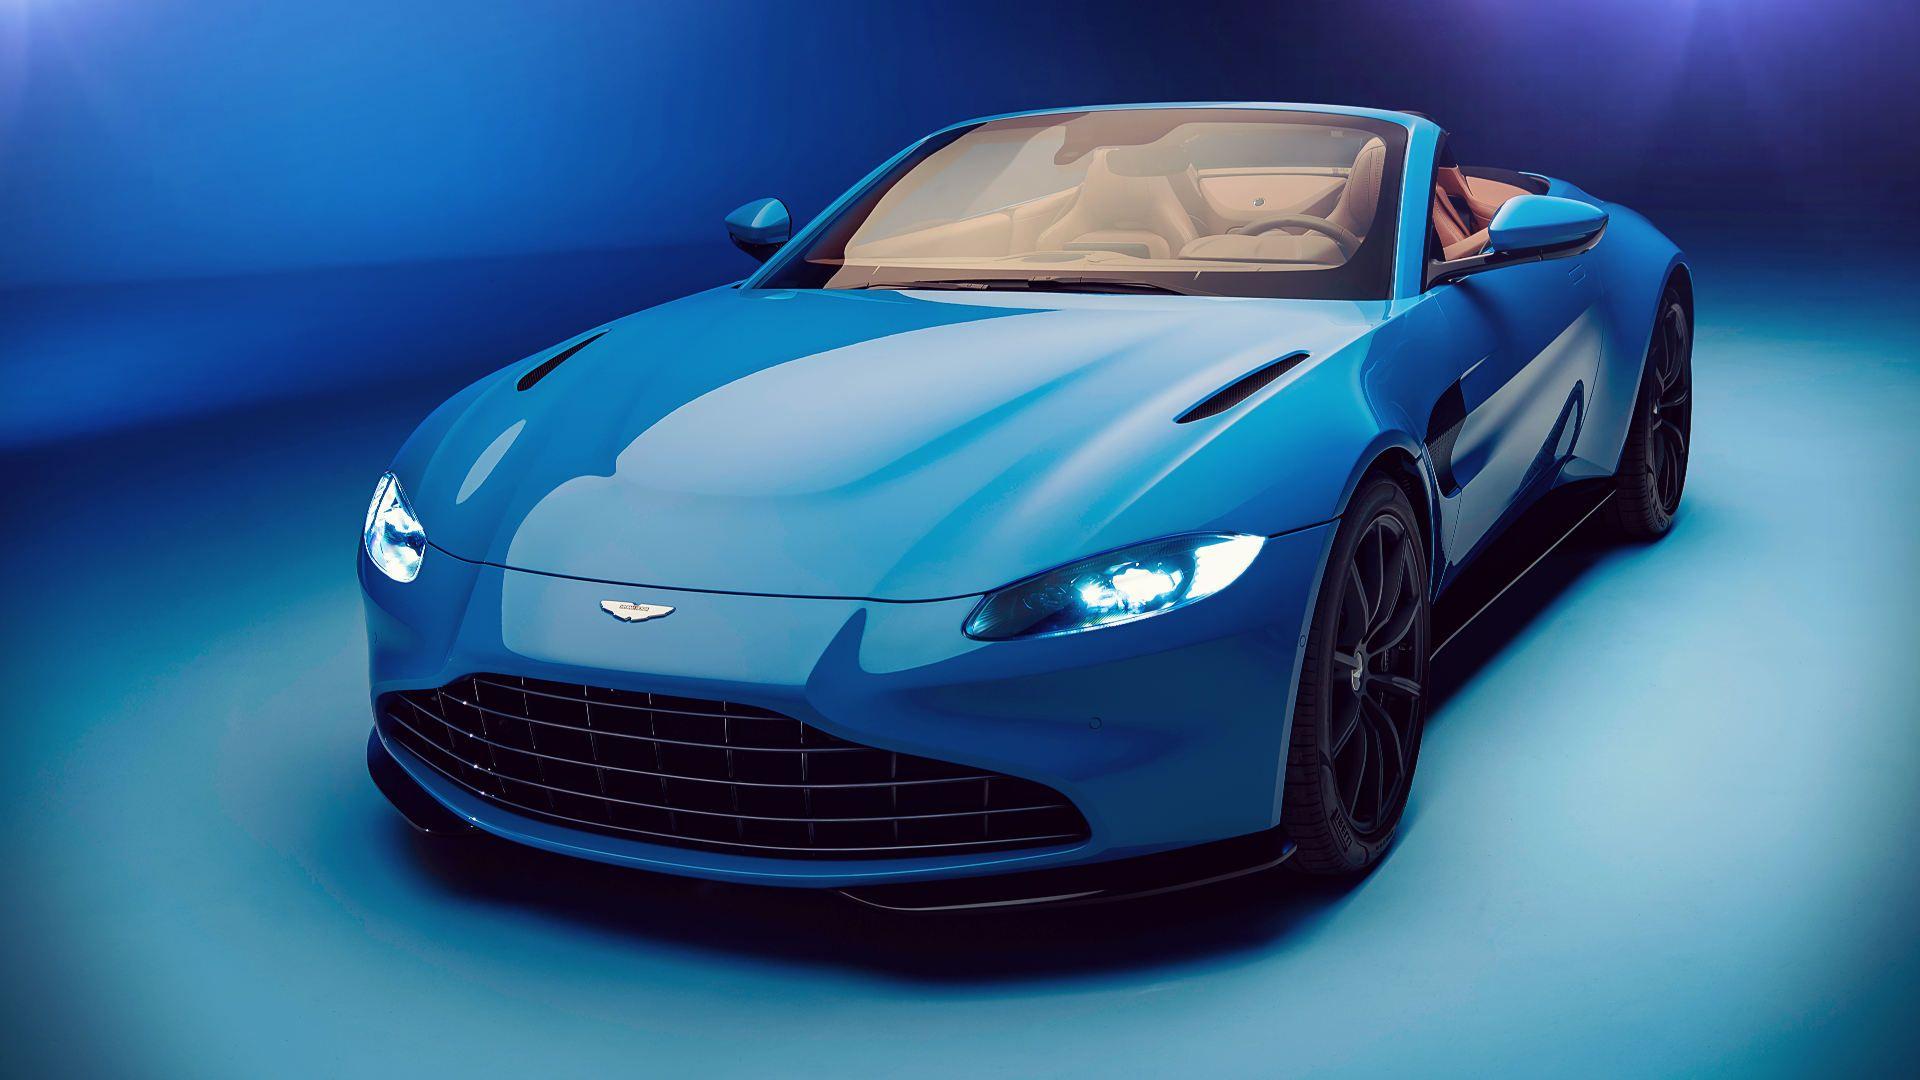 Aston Martin Vantage Roadster 2021 Wallpaper in 2020